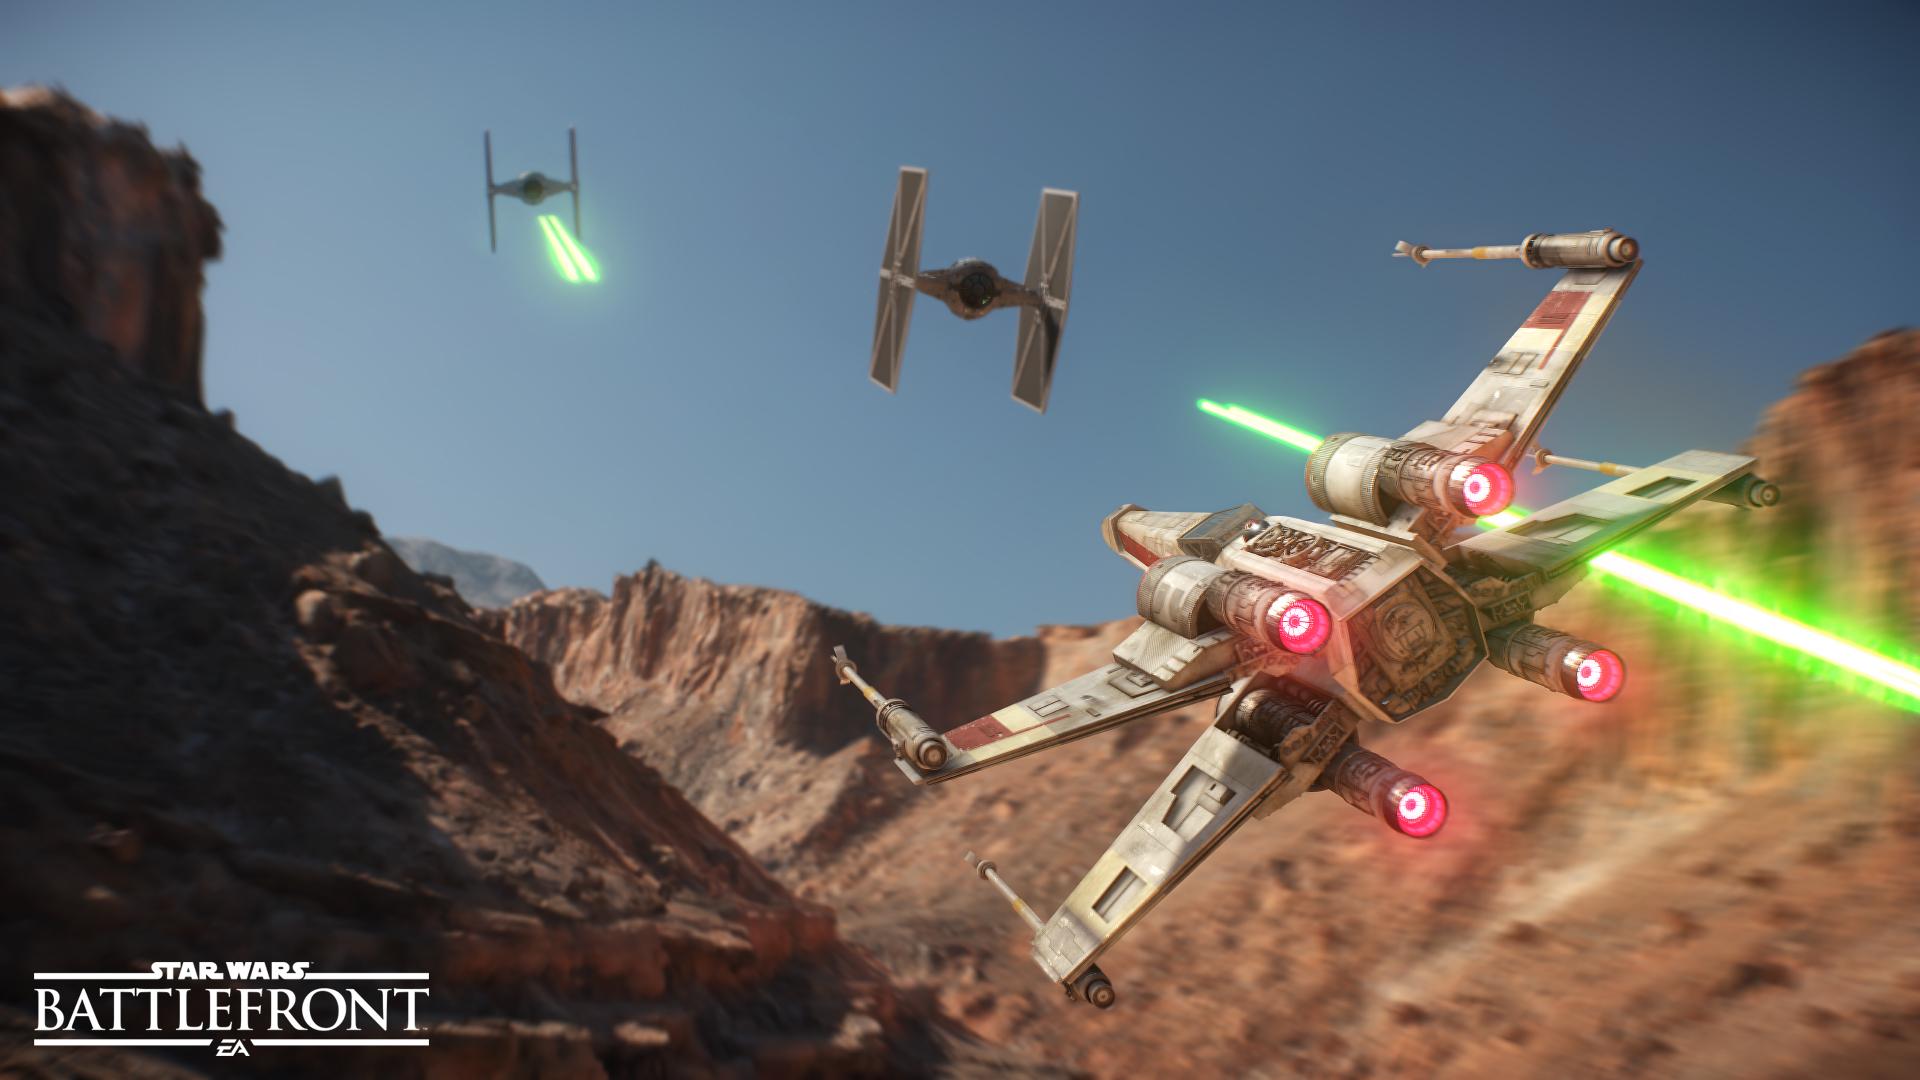 star wars battlefront battaglia aerea tie fighter vs x-wing